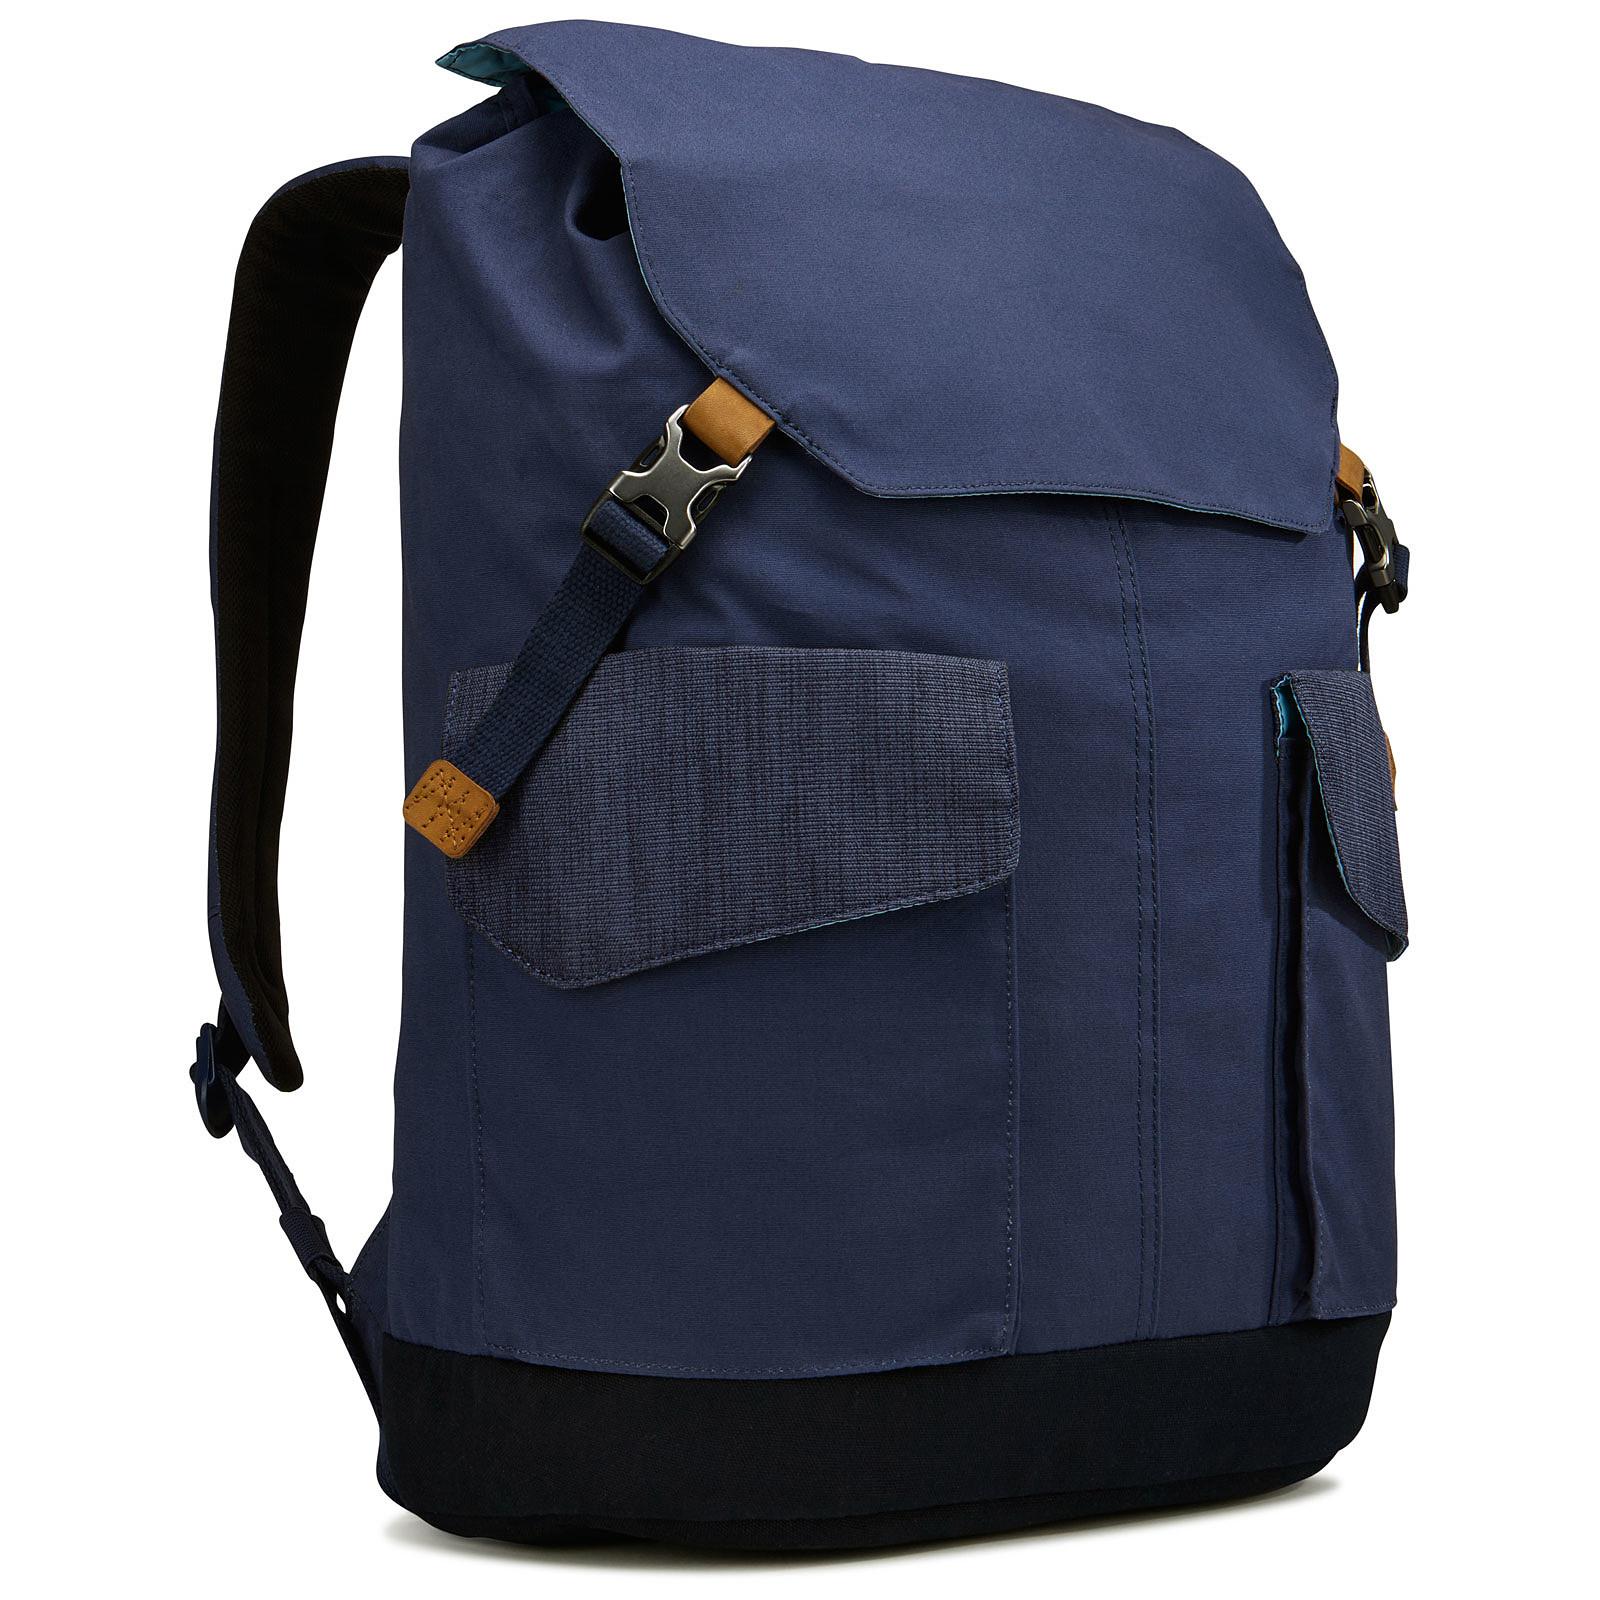 Case Logic Lodo Backpack Large (bleu)